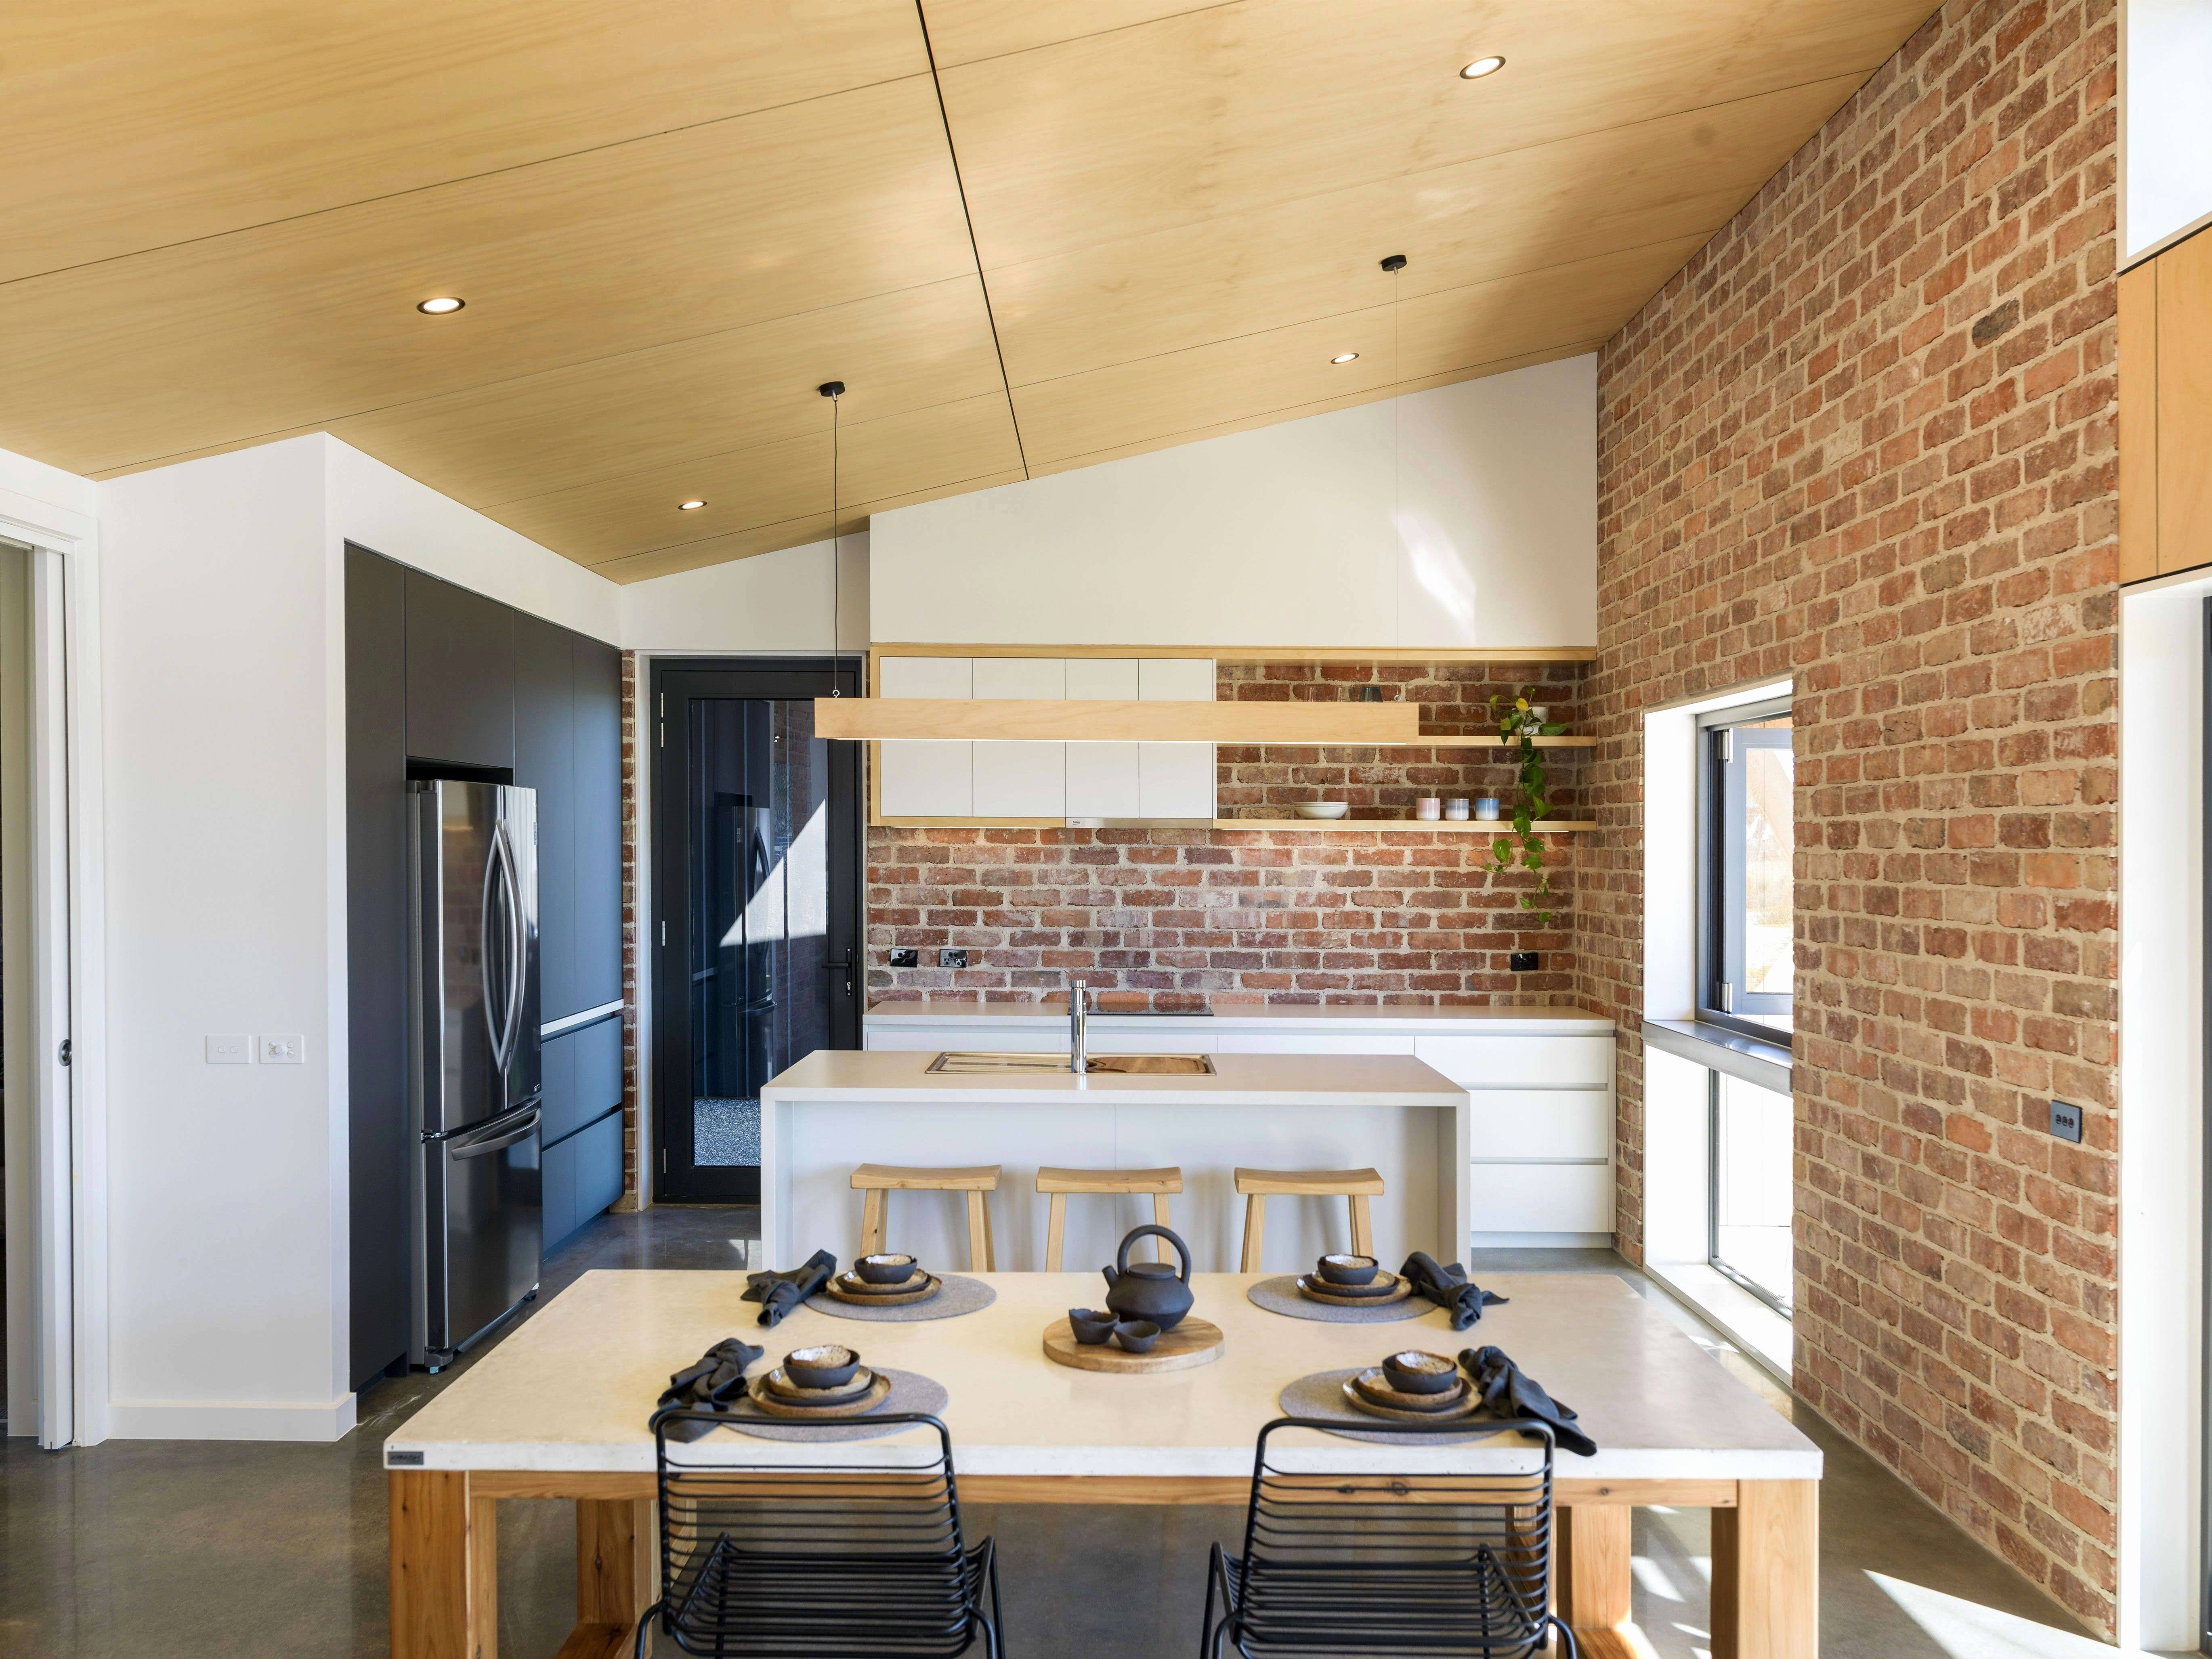 back splash ideas for kitchen fresh kitchen decor items new kitchen of kitchen cabinets and backsplash ideas